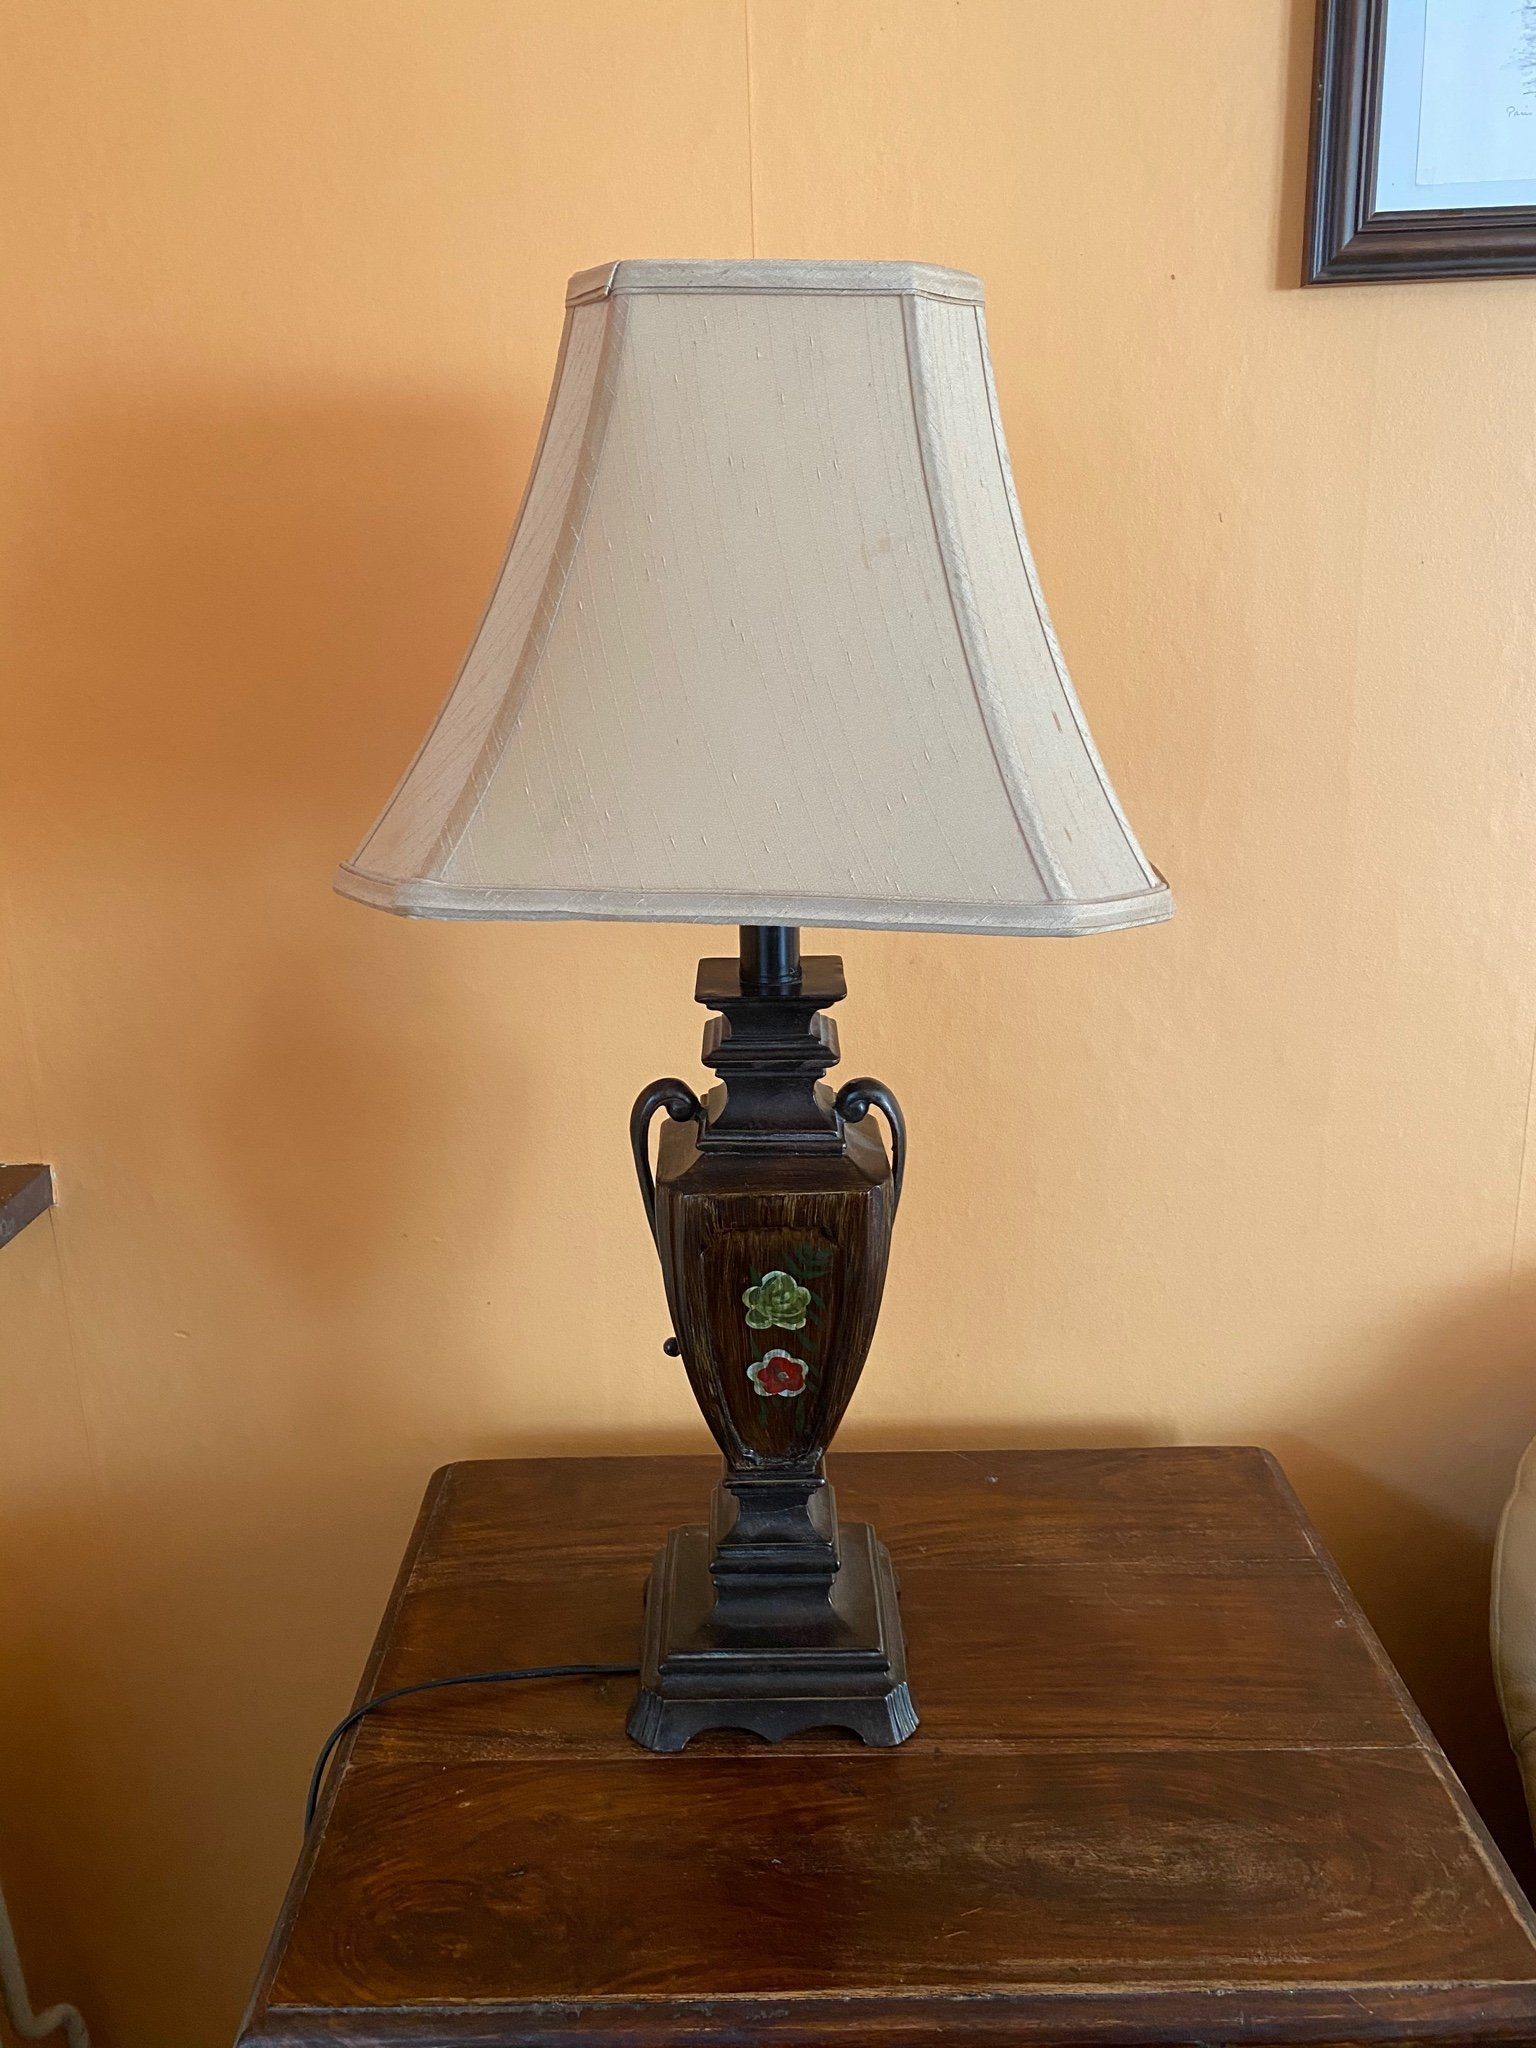 ASIATISK STIL LAMPA BRUN BEIGE